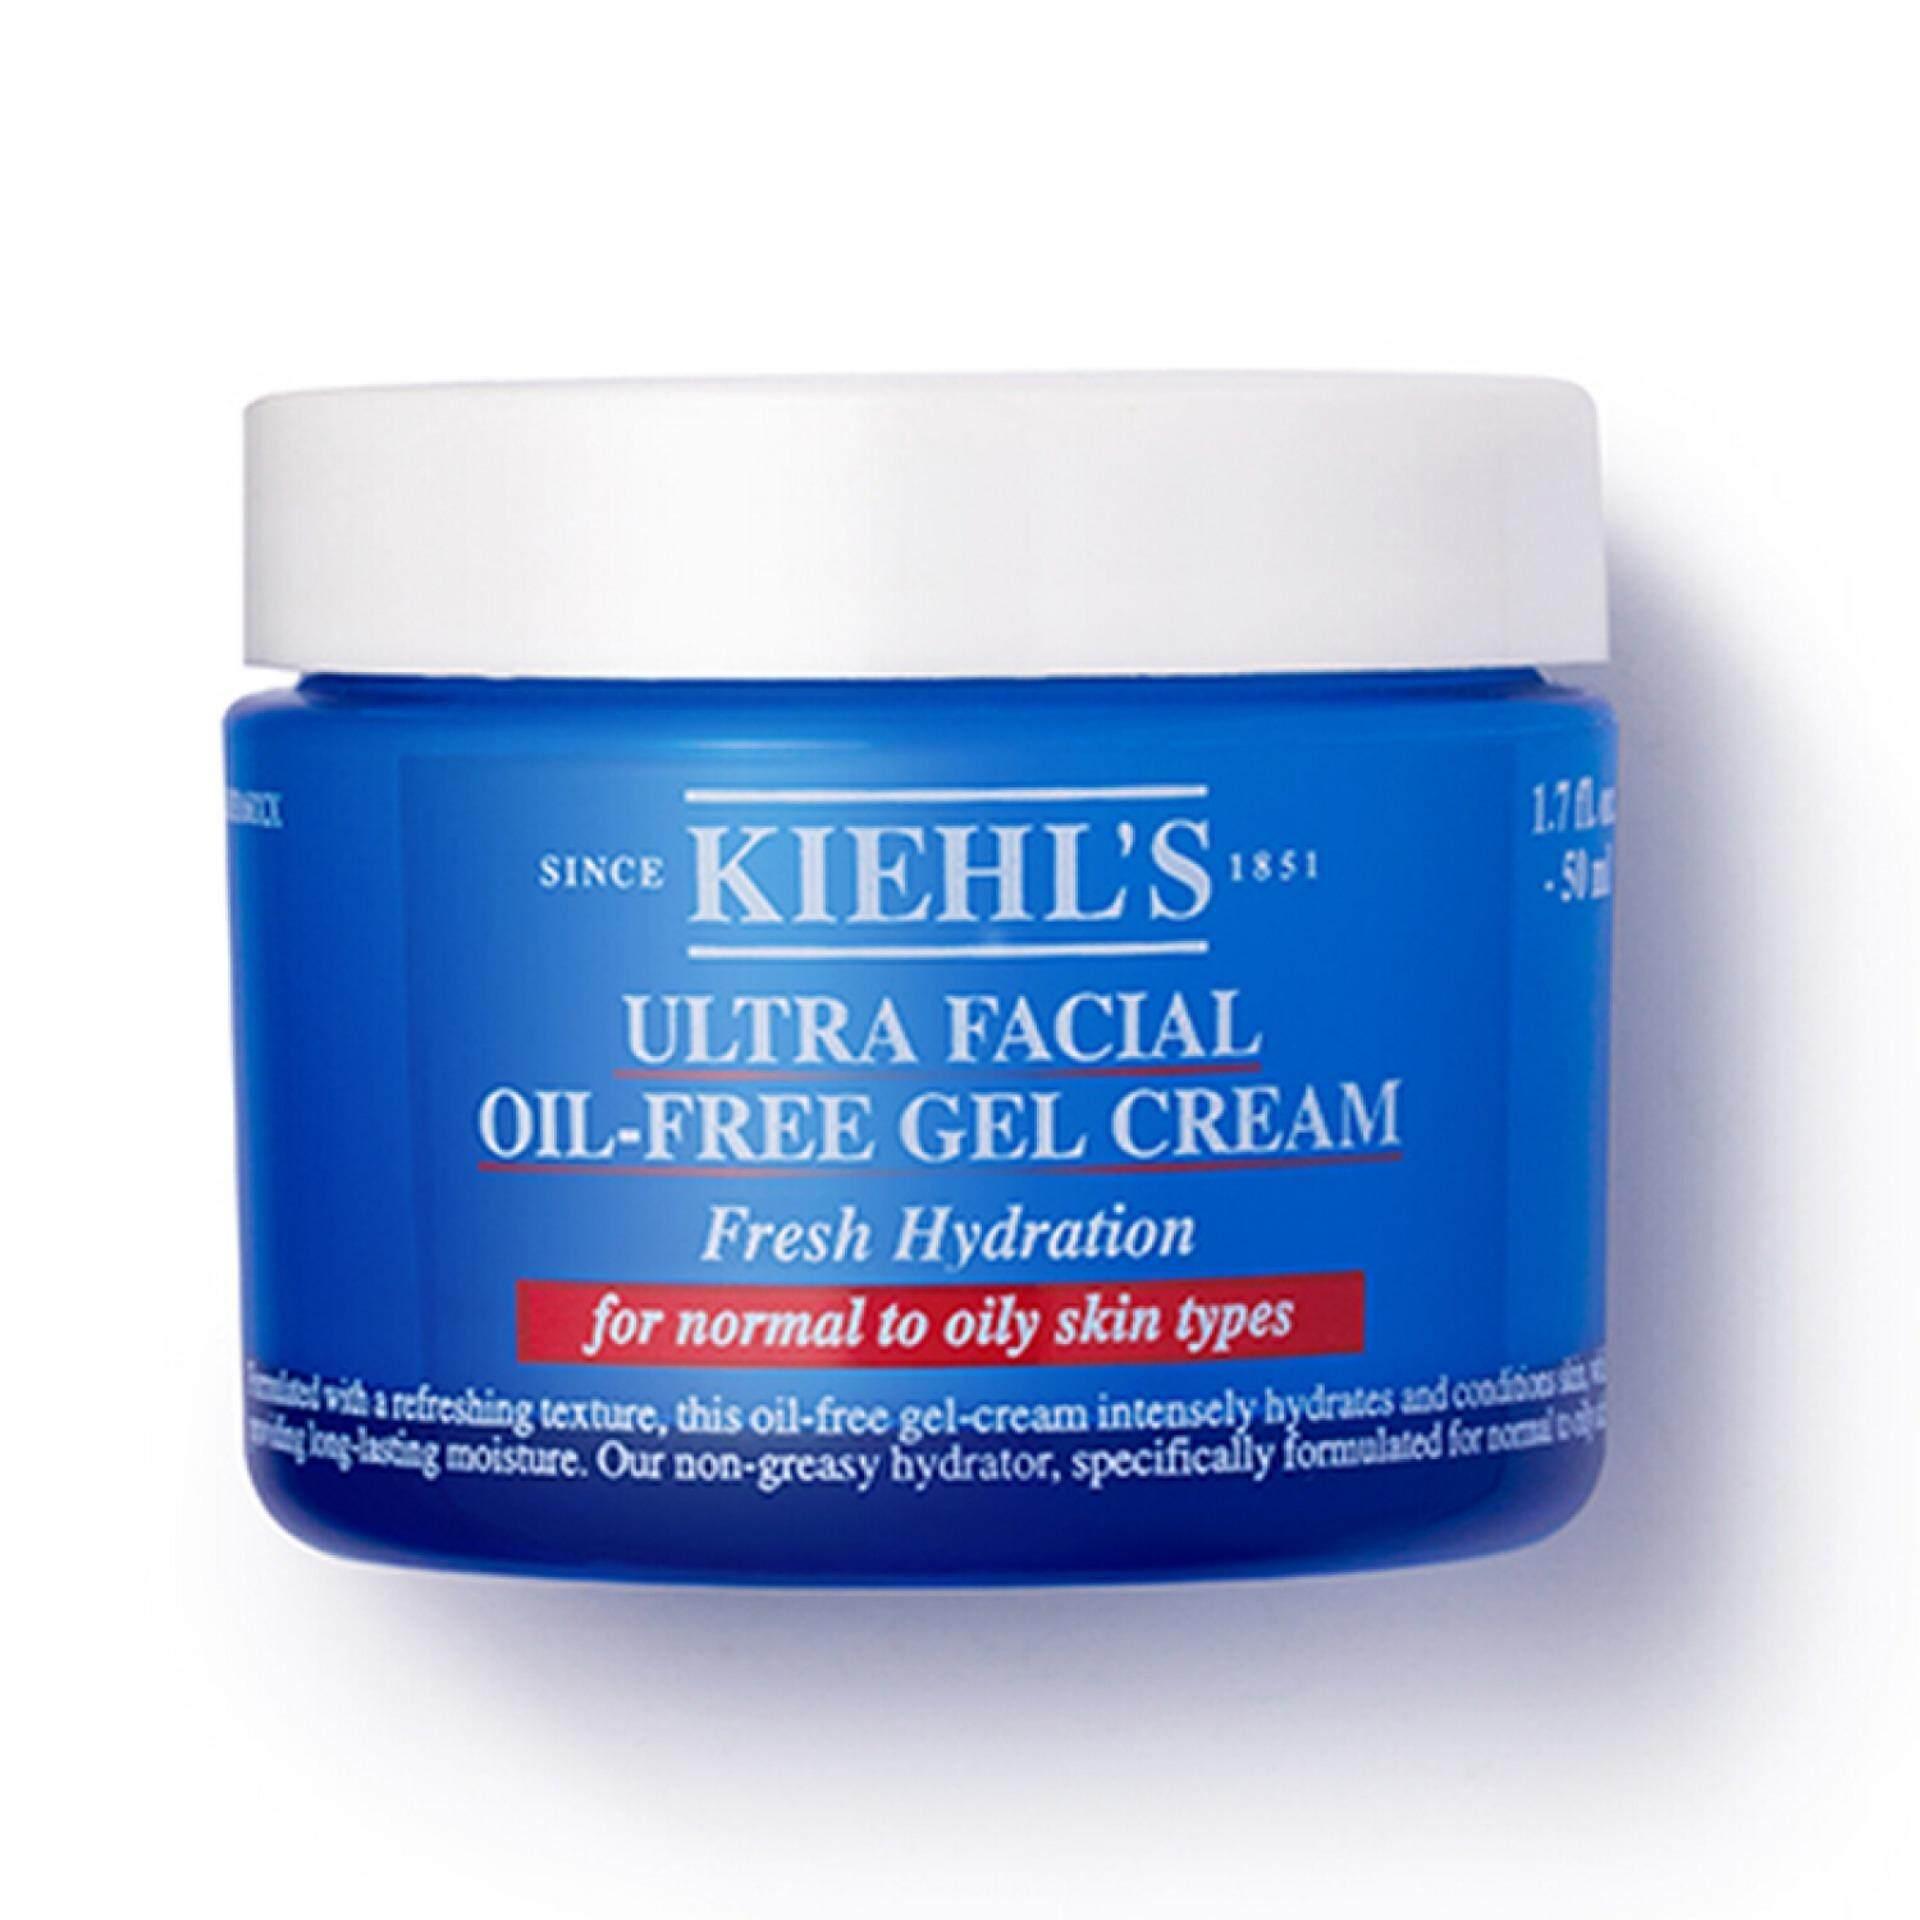 Kiehl's Ultra Facial Oil-Free Gel Cream (50ml)